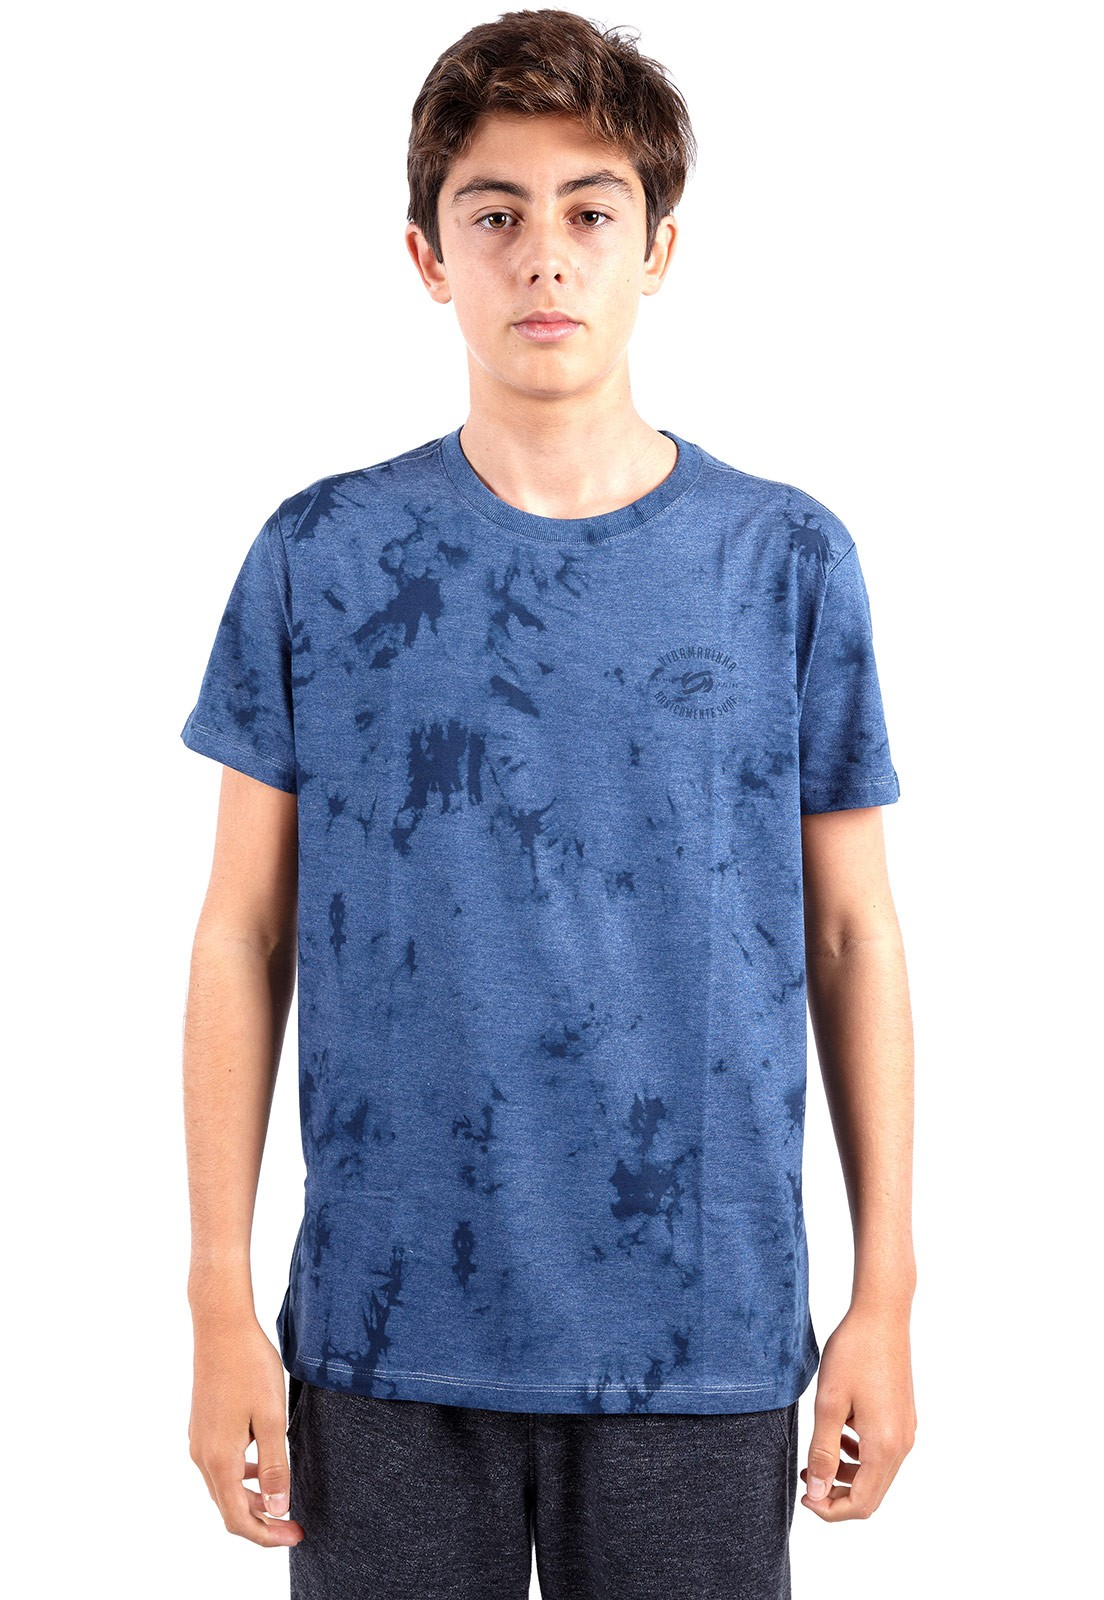 Camiseta Infantil Vida Marinha Manga Curta Azul